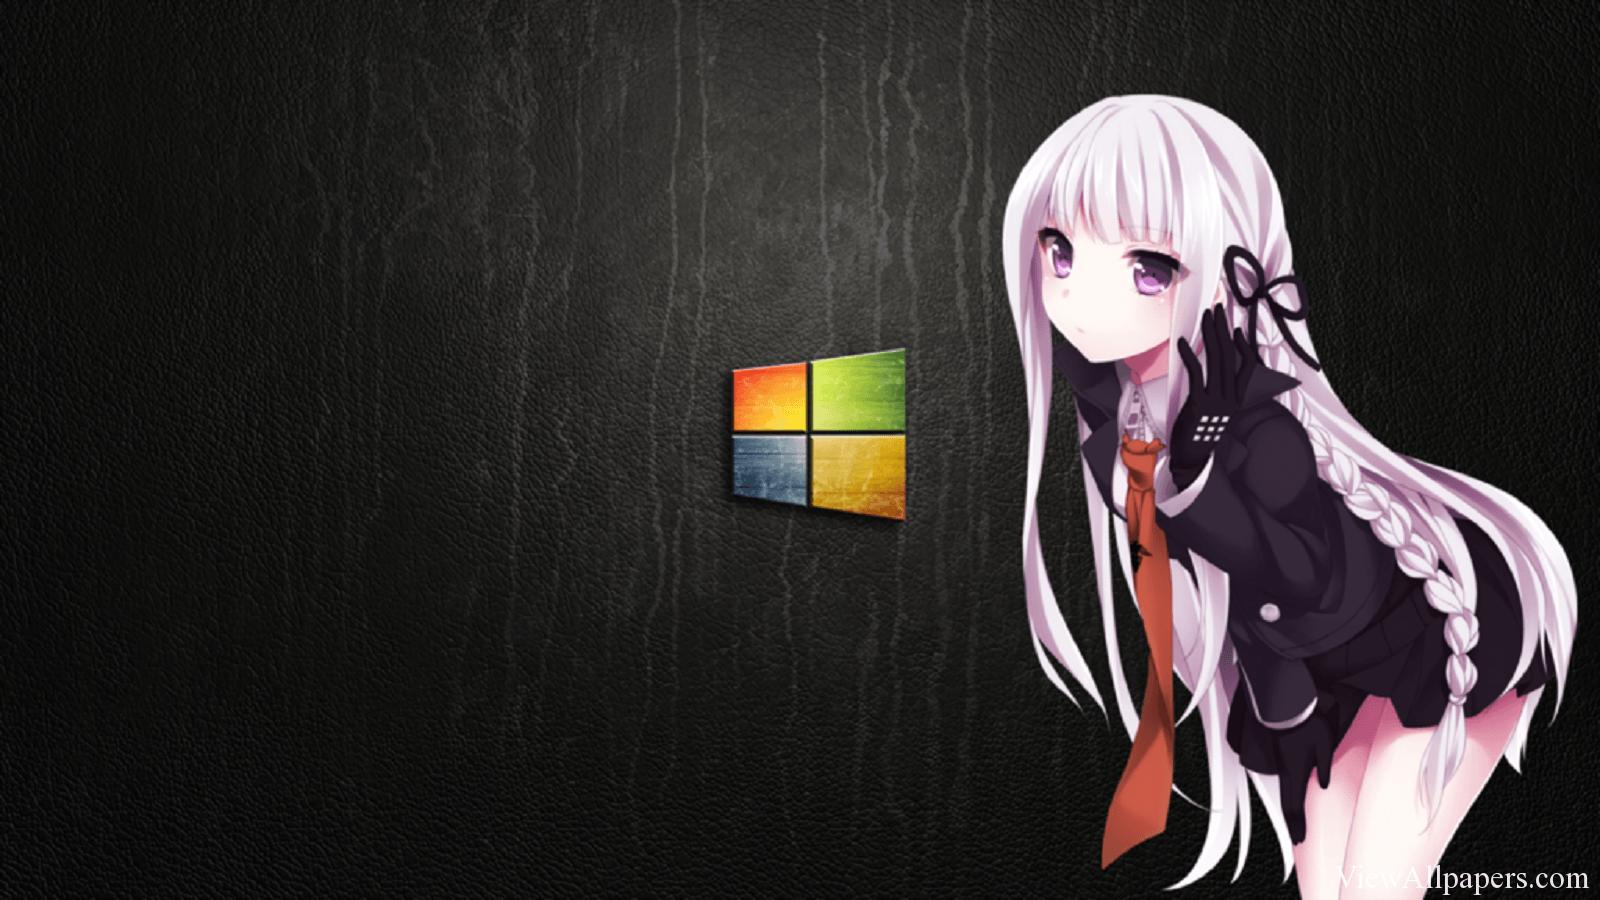 Anime Laptop Wallpapers Top Free Anime Laptop